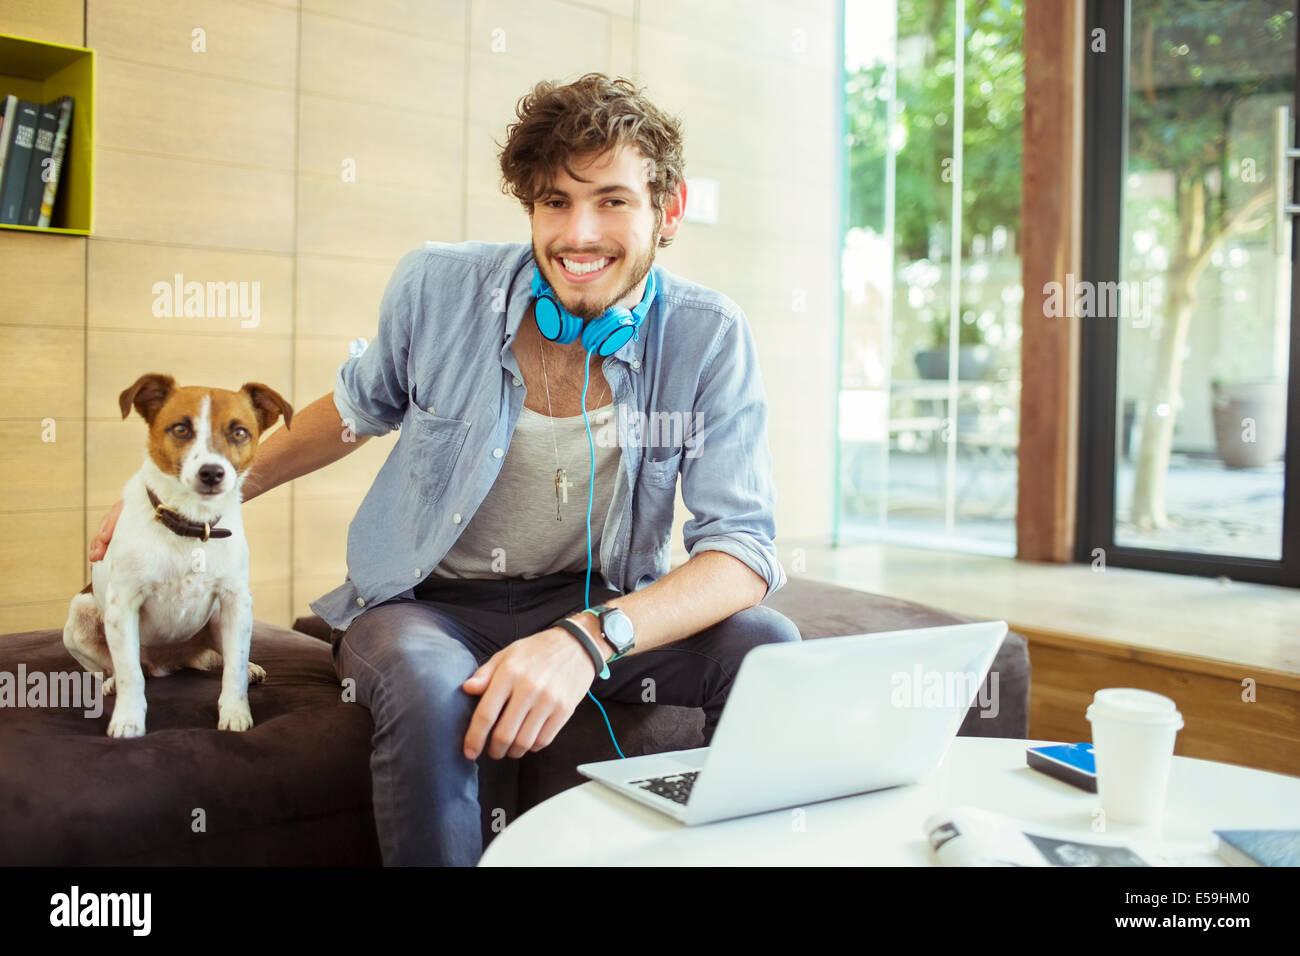 Hombre acariciar a perros en Office Imagen De Stock